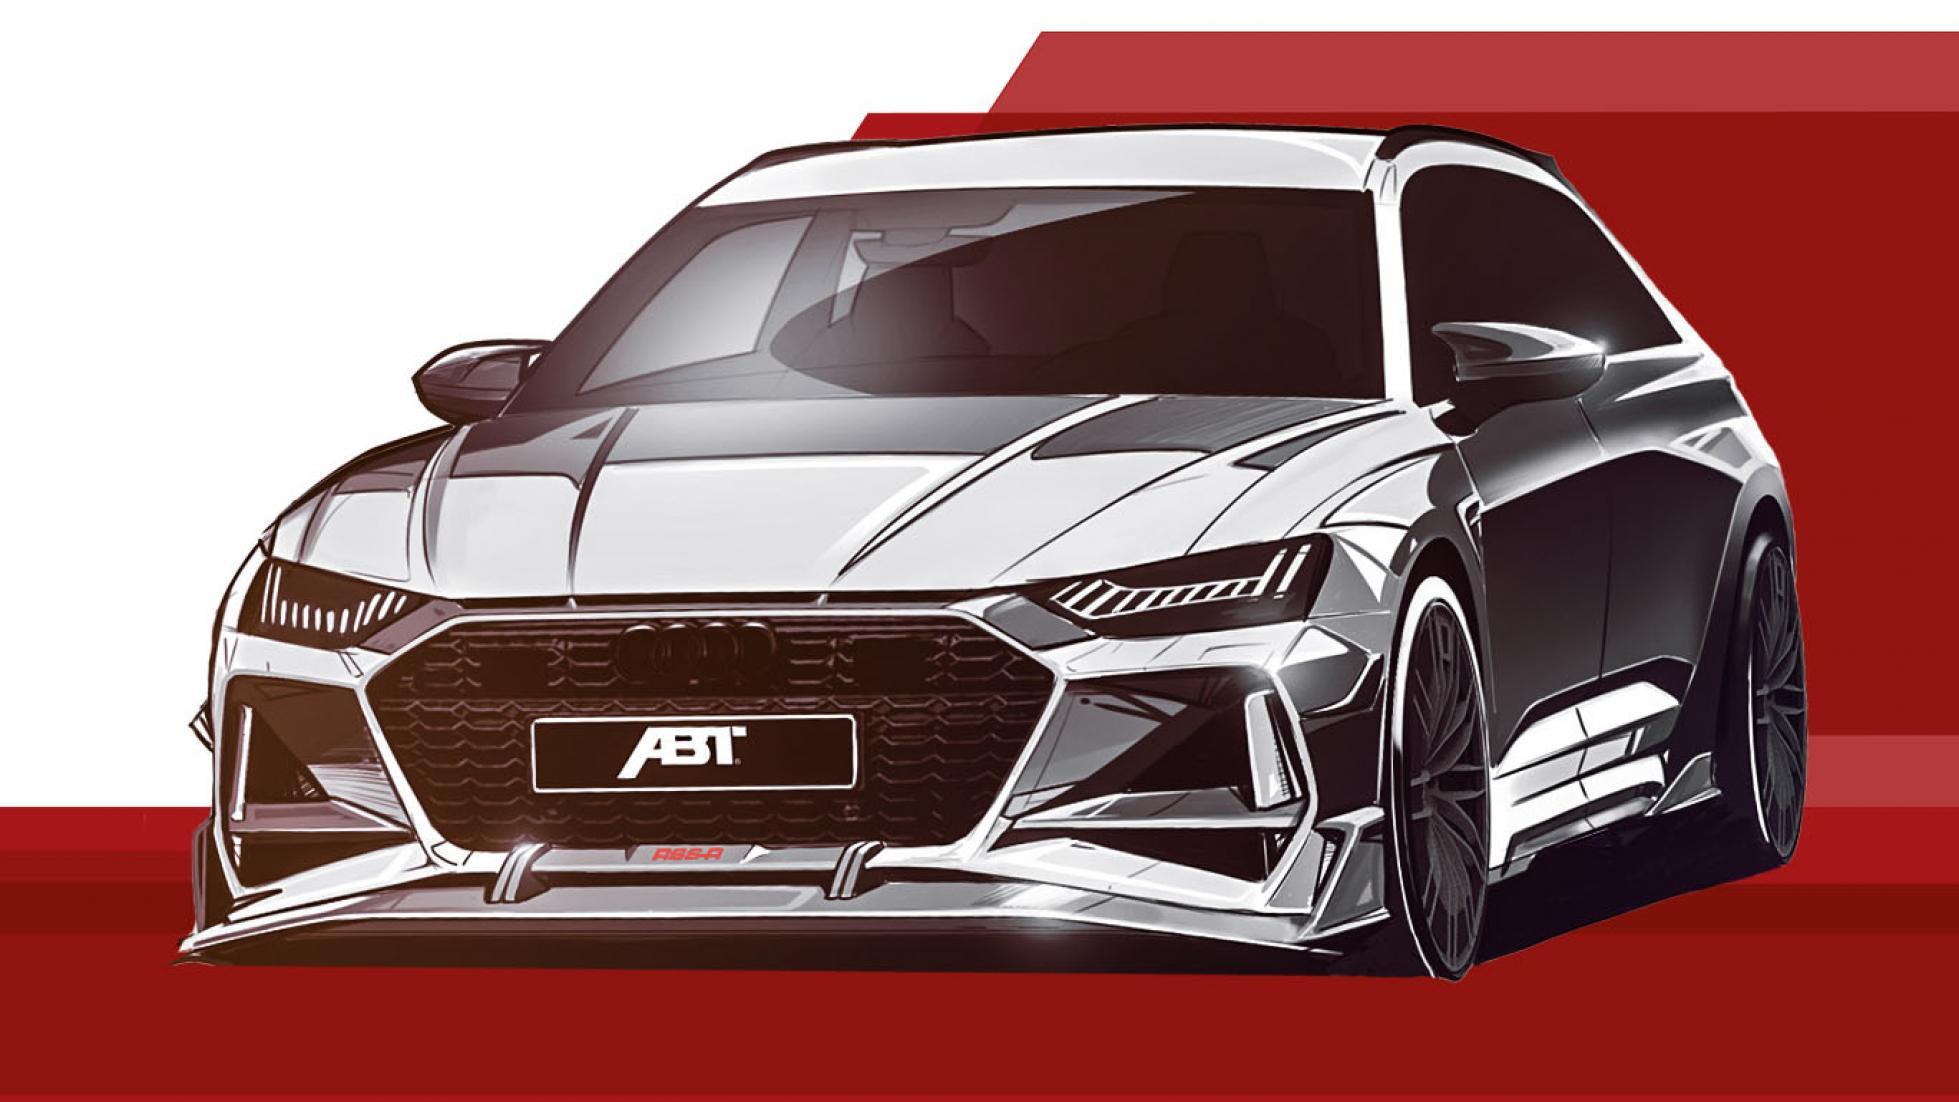 Schets van de Abt Audi RS 6-R